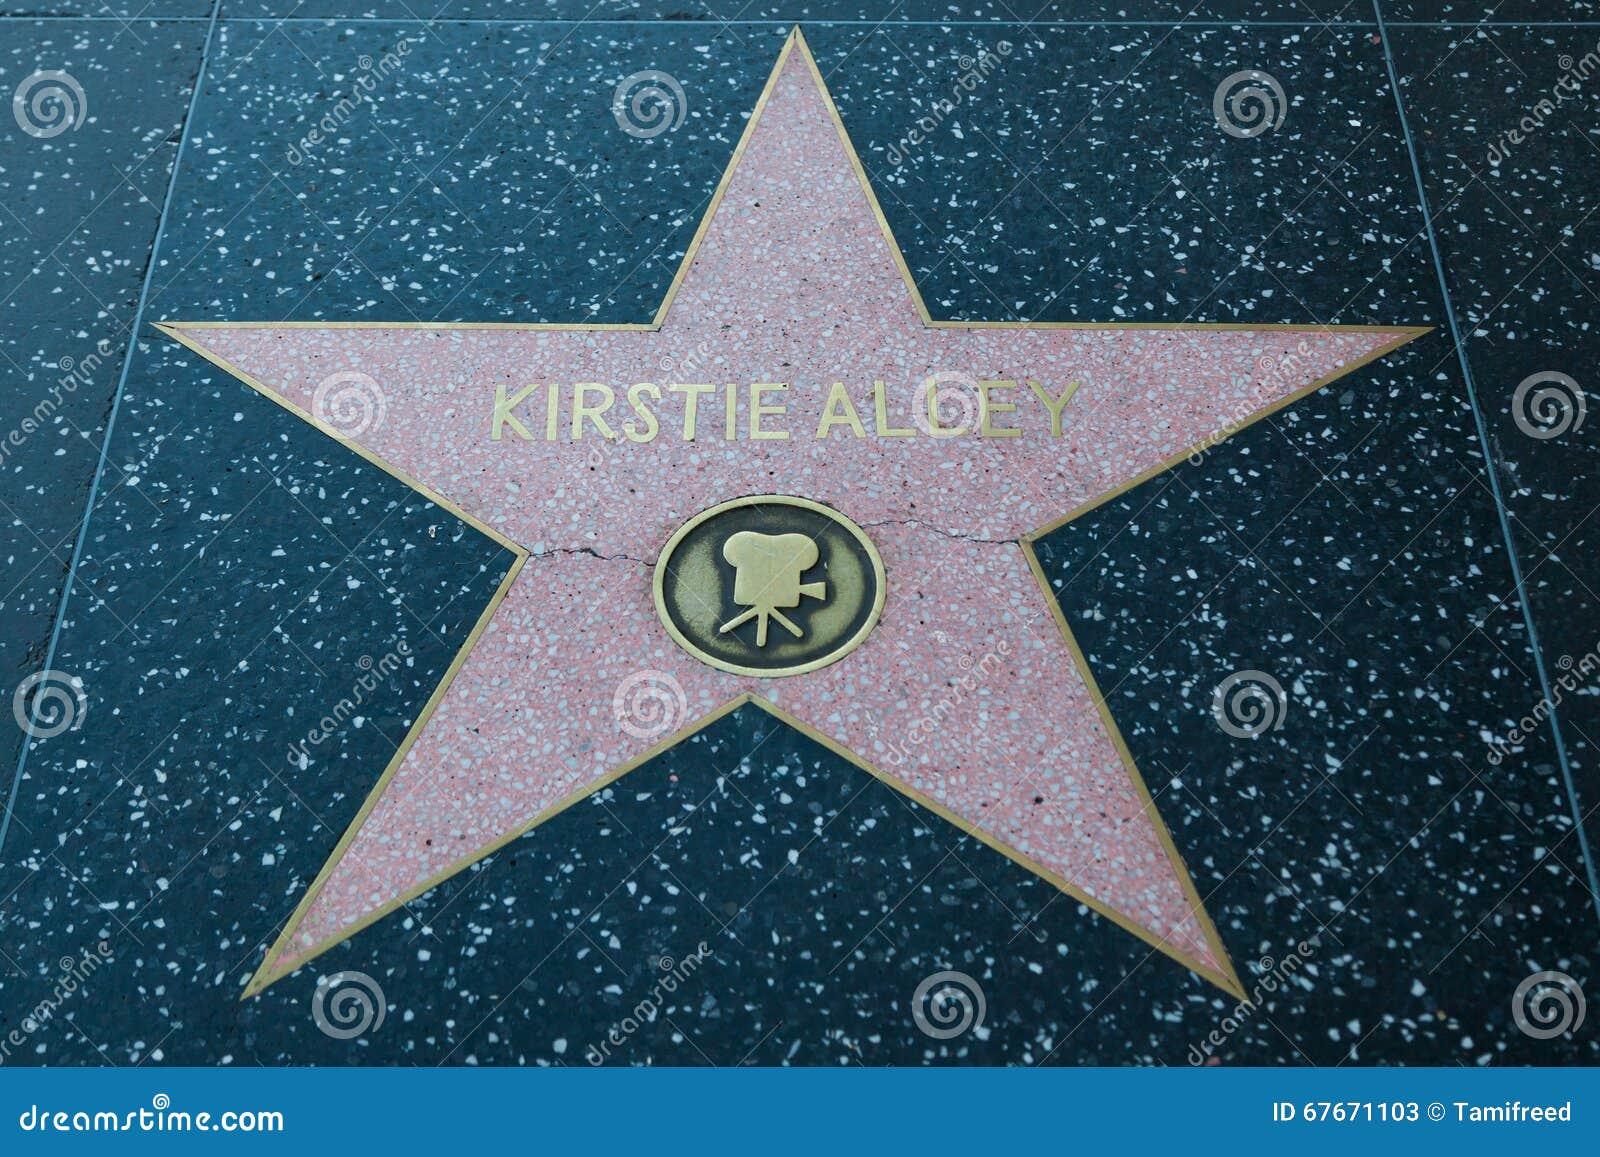 Kirstie Alley Hollywood Star